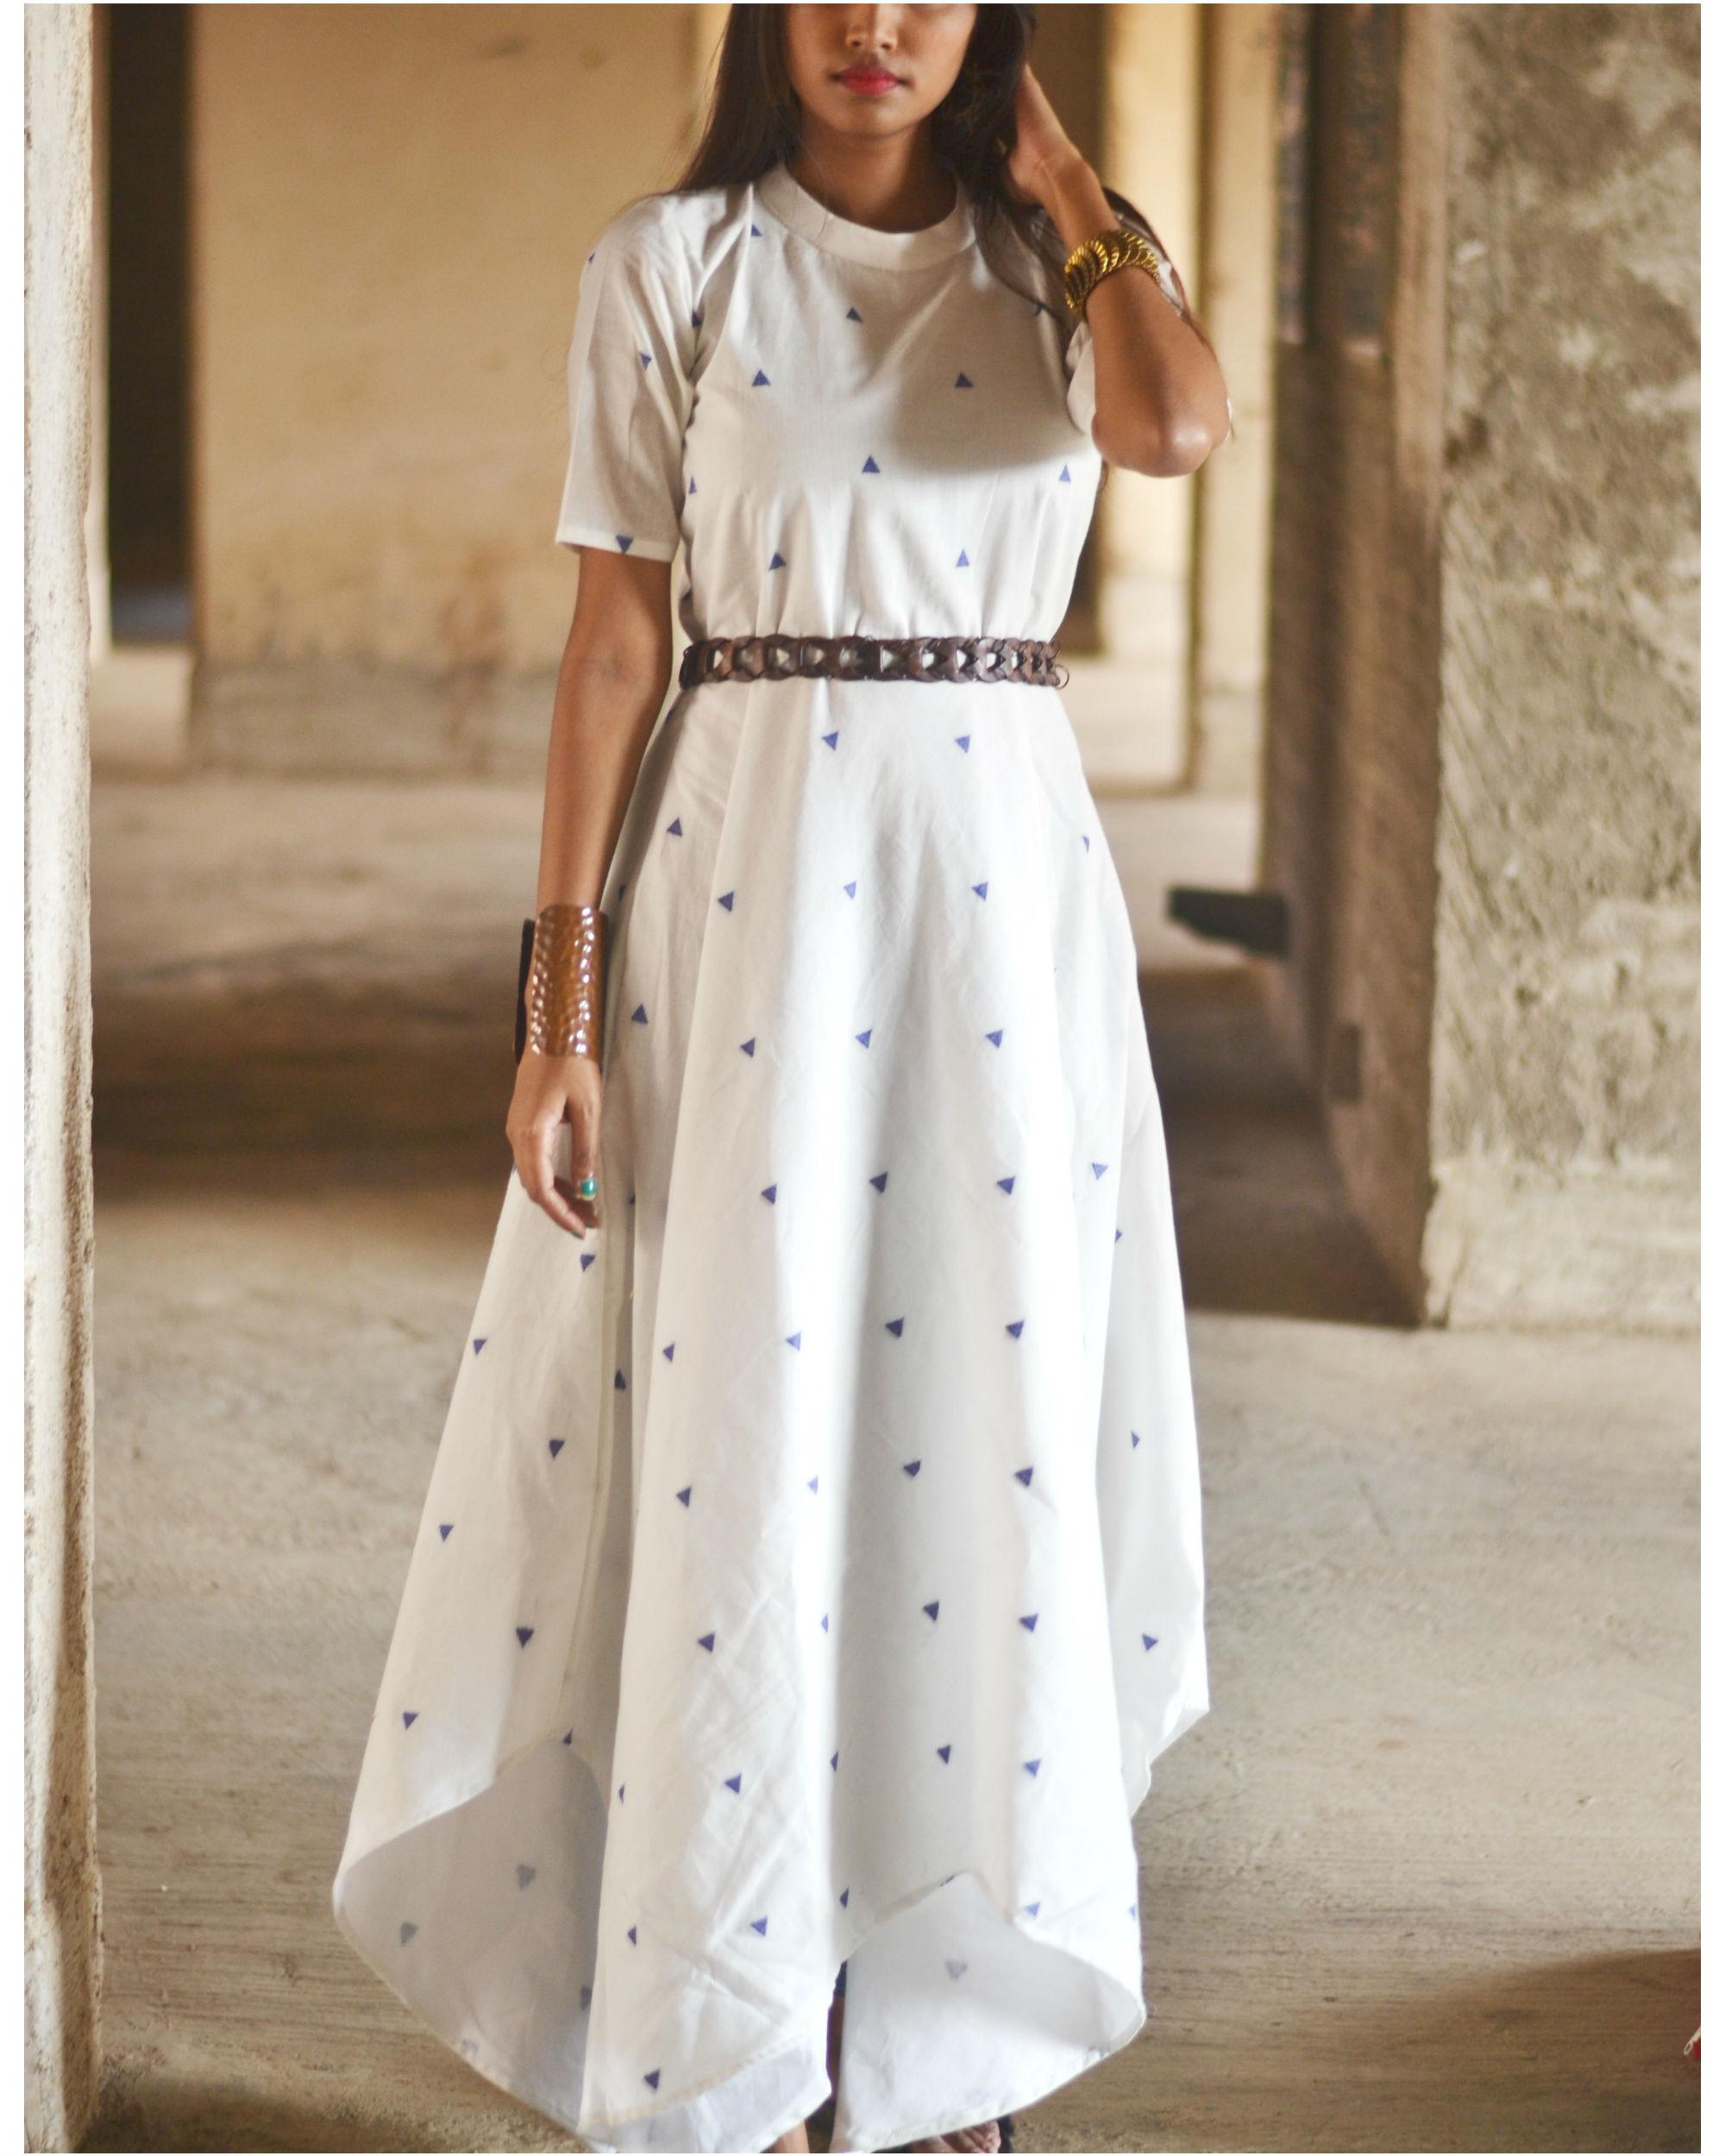 White uneven hemline dress